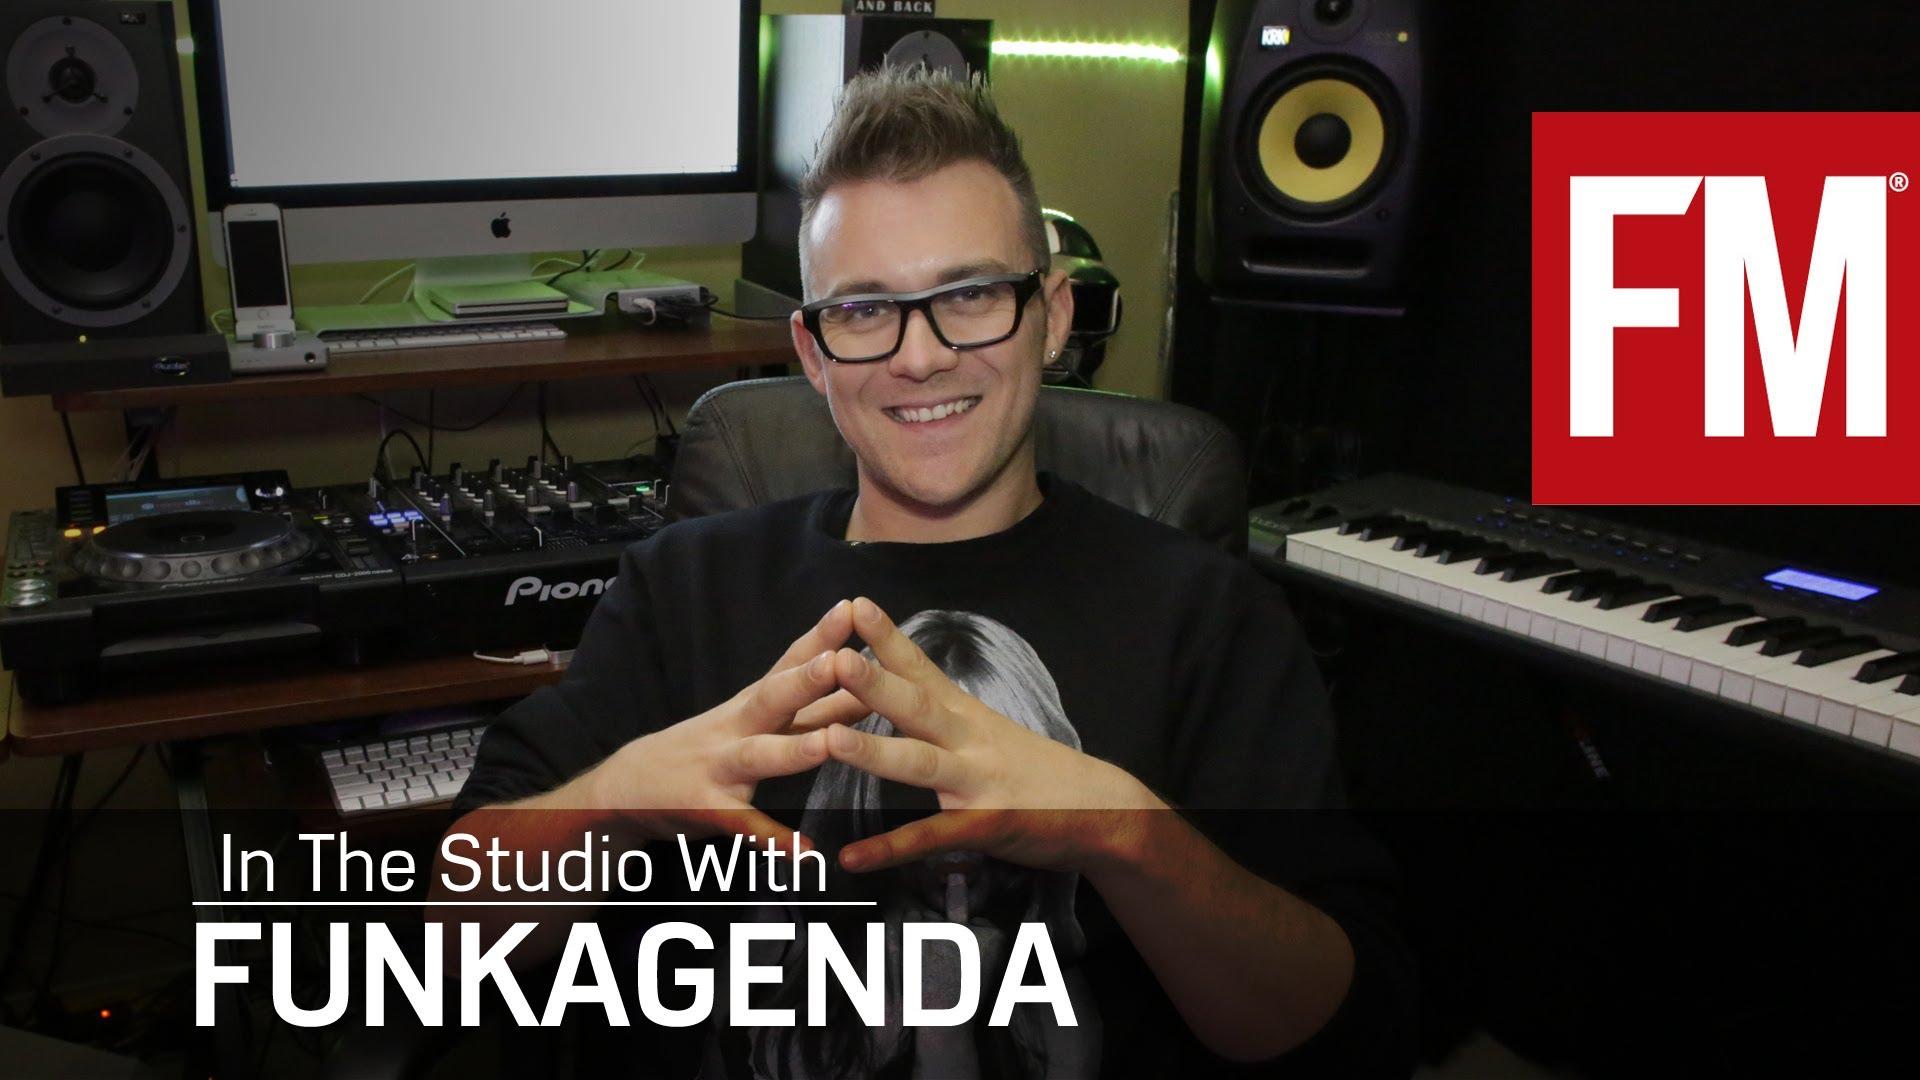 Funkagenda And Future Music Tutorial On NI Massive